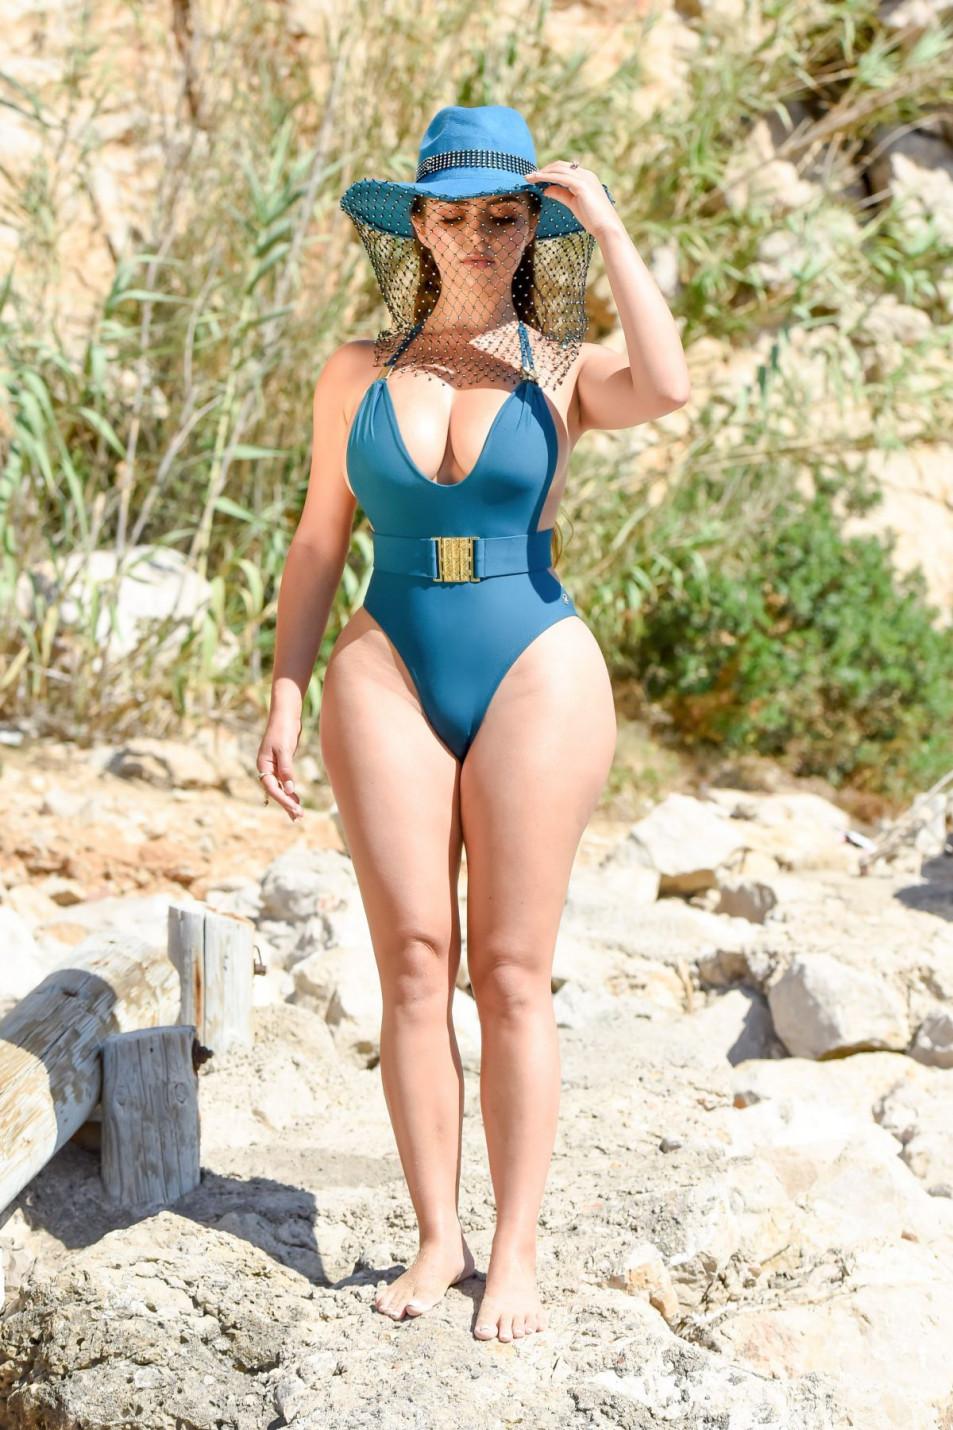 Demi-Rose-Mawby-swimsuit-photo-shoot-5.jpg